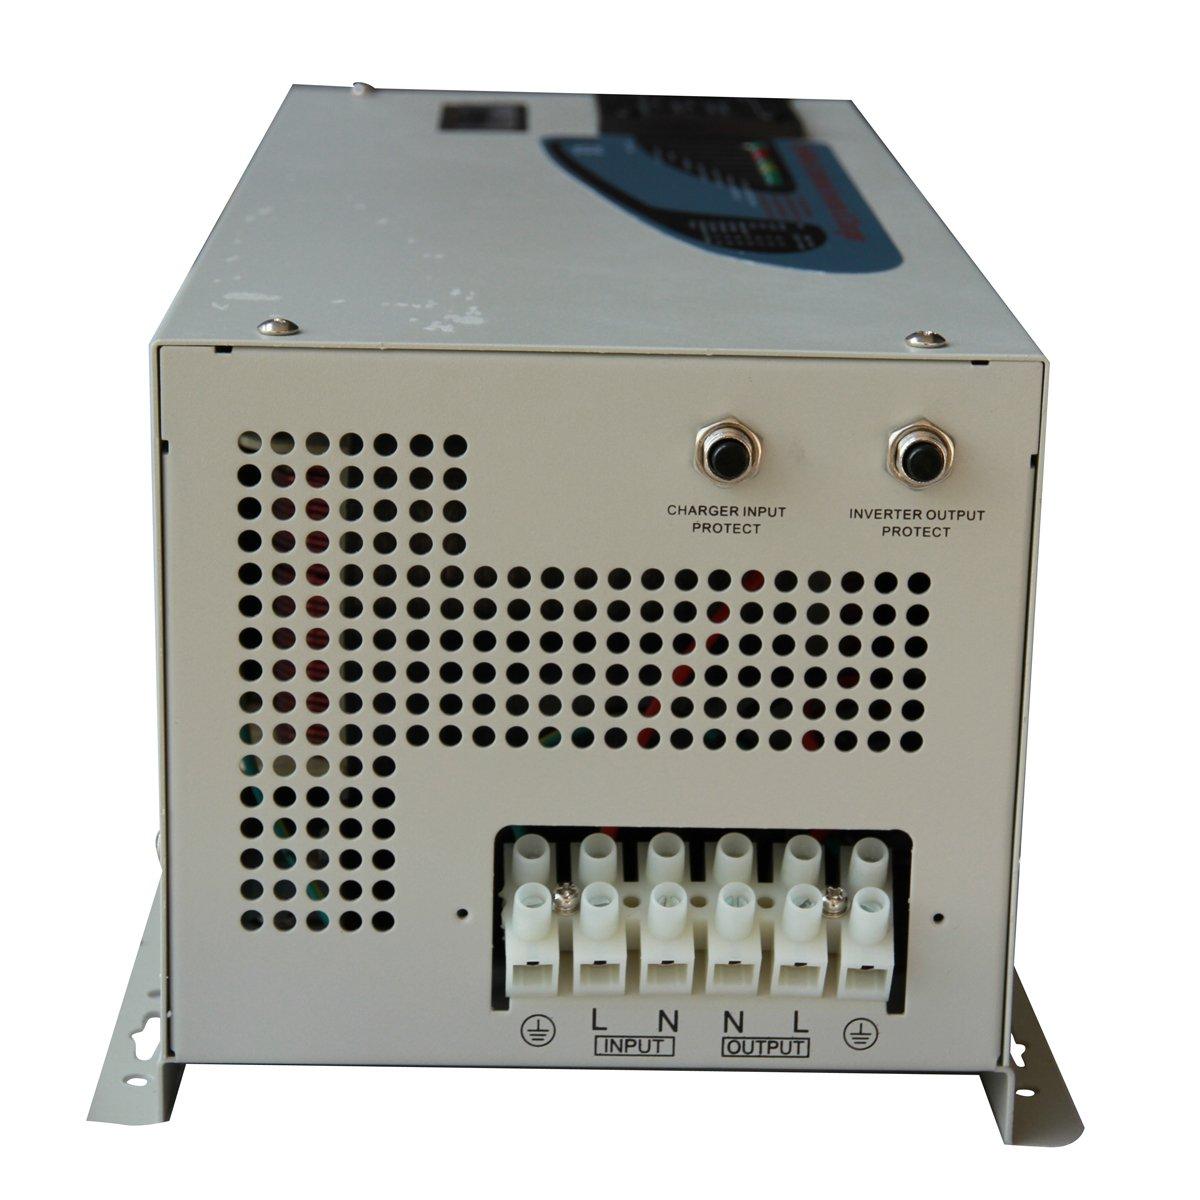 Amazon.com: GTSUN 3000w Peak 9000w Pure Sine Wave Inverter with ...